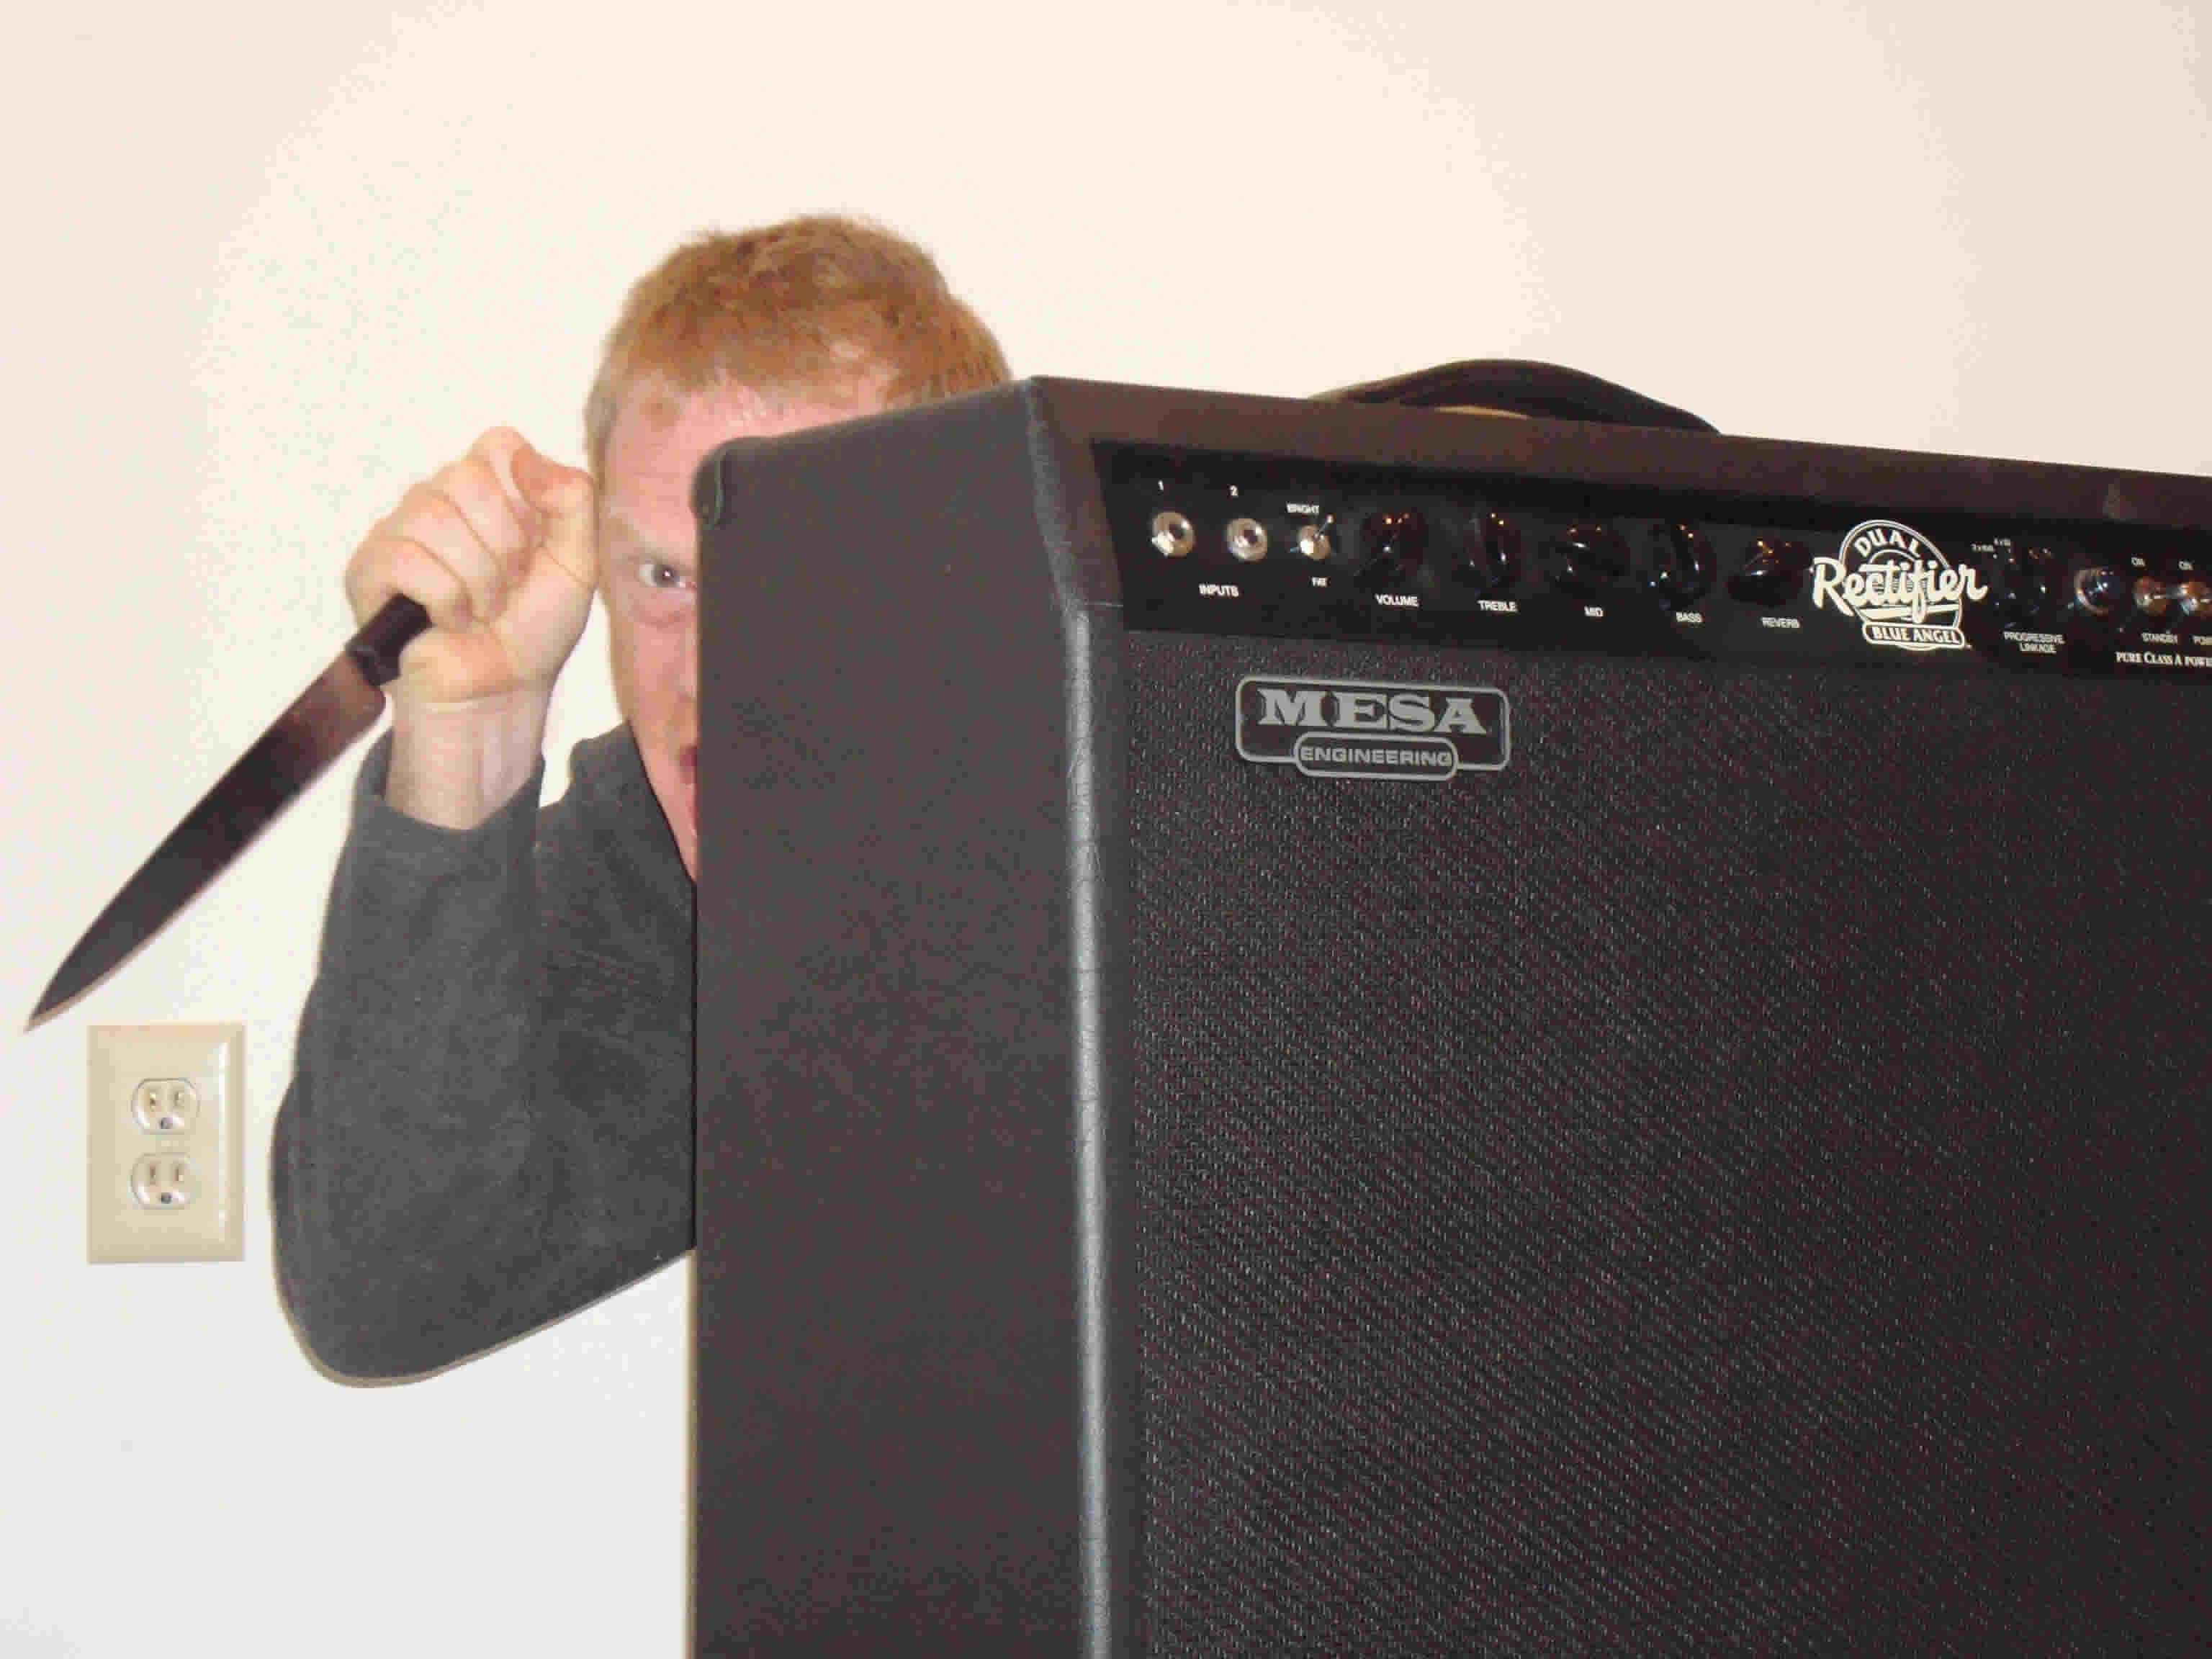 The Amplifier Prank